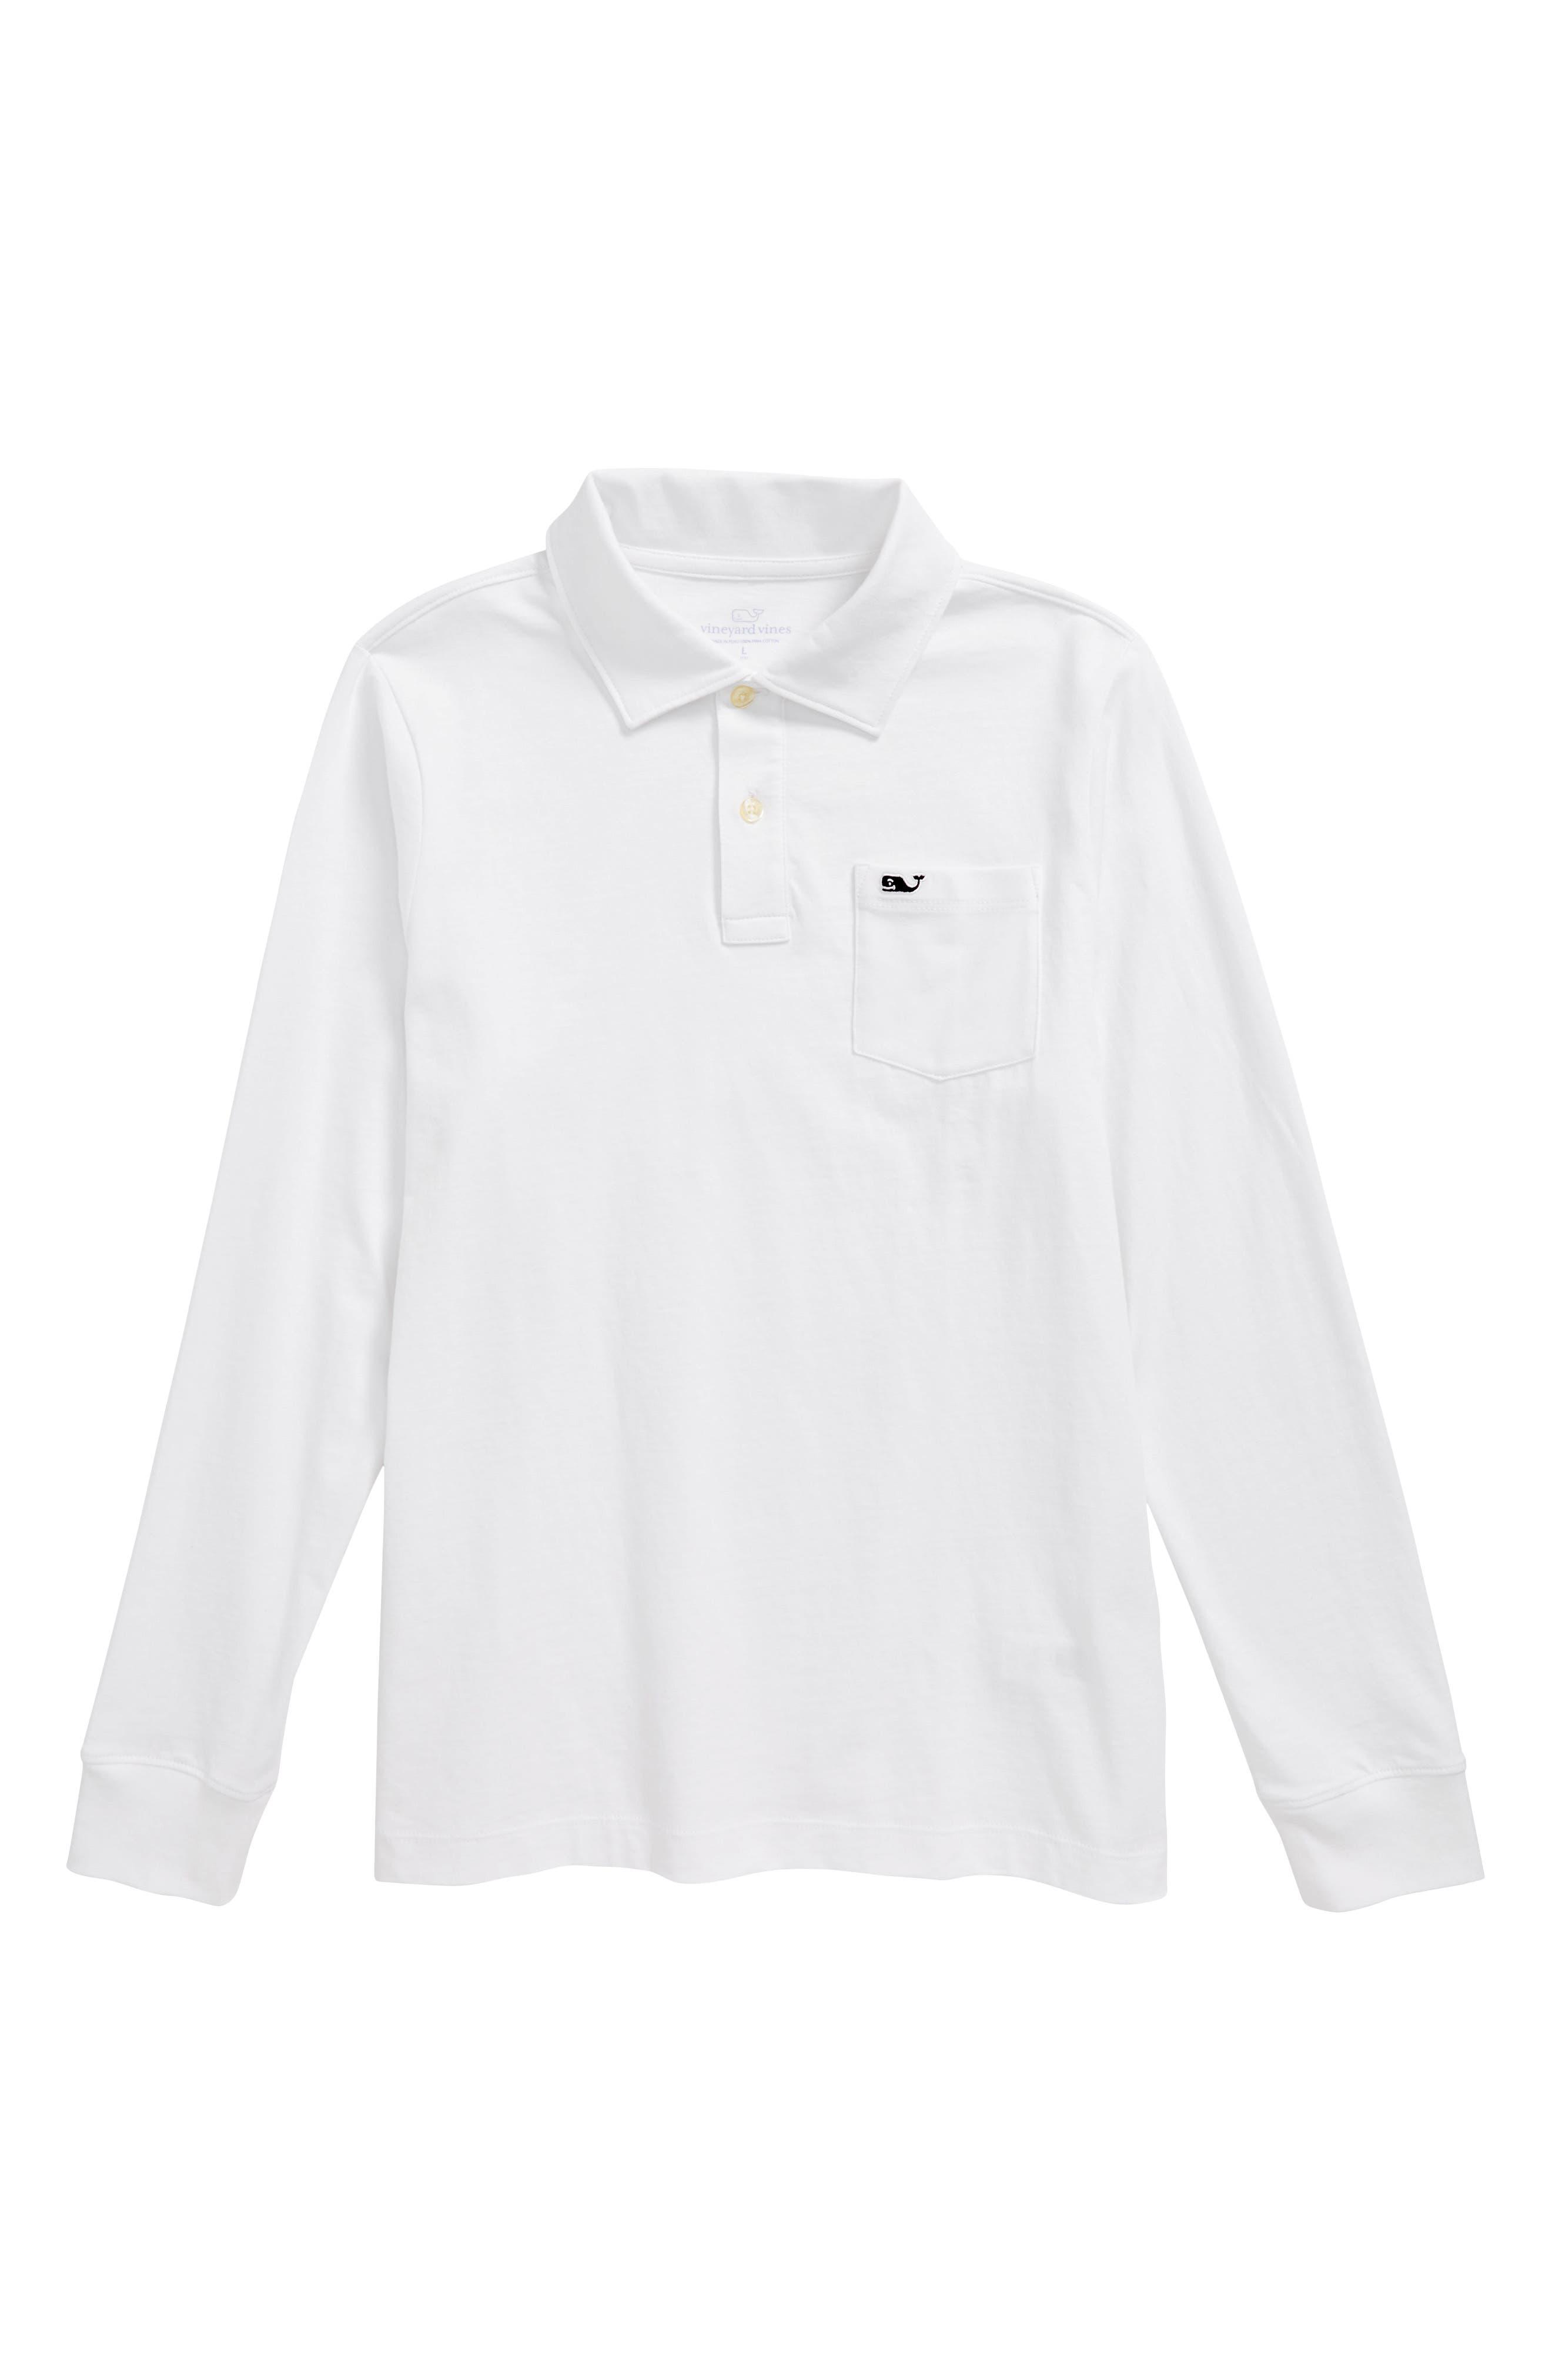 Pima Cotton Jersey Polo,                             Main thumbnail 1, color,                             White Cap